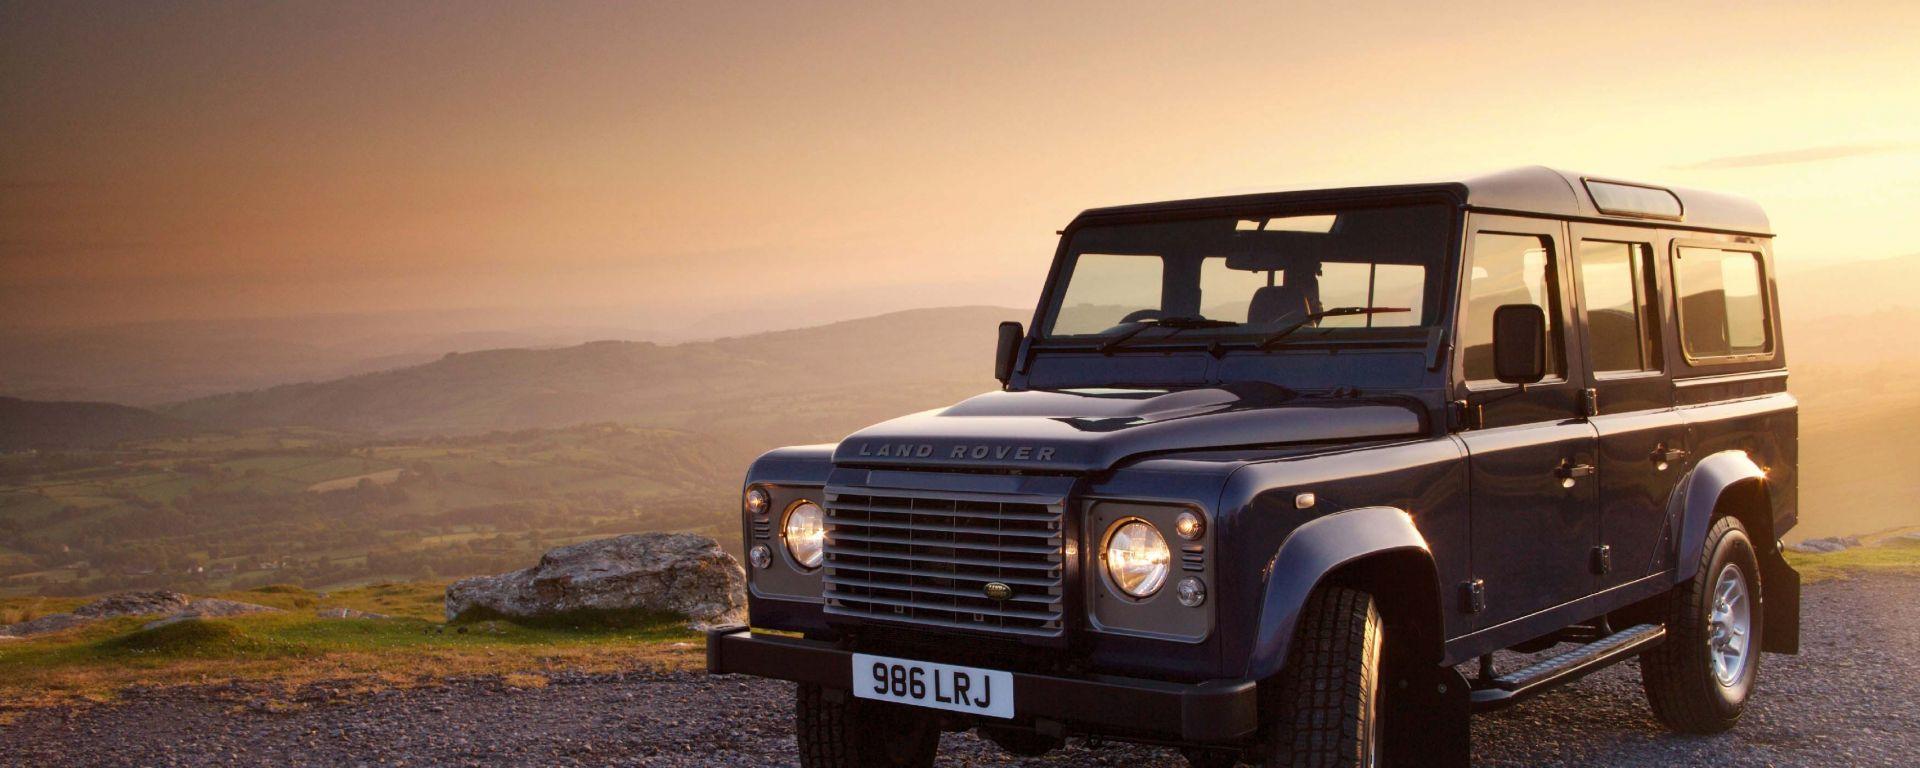 Land Rover Defender: nel 2013 si cambia